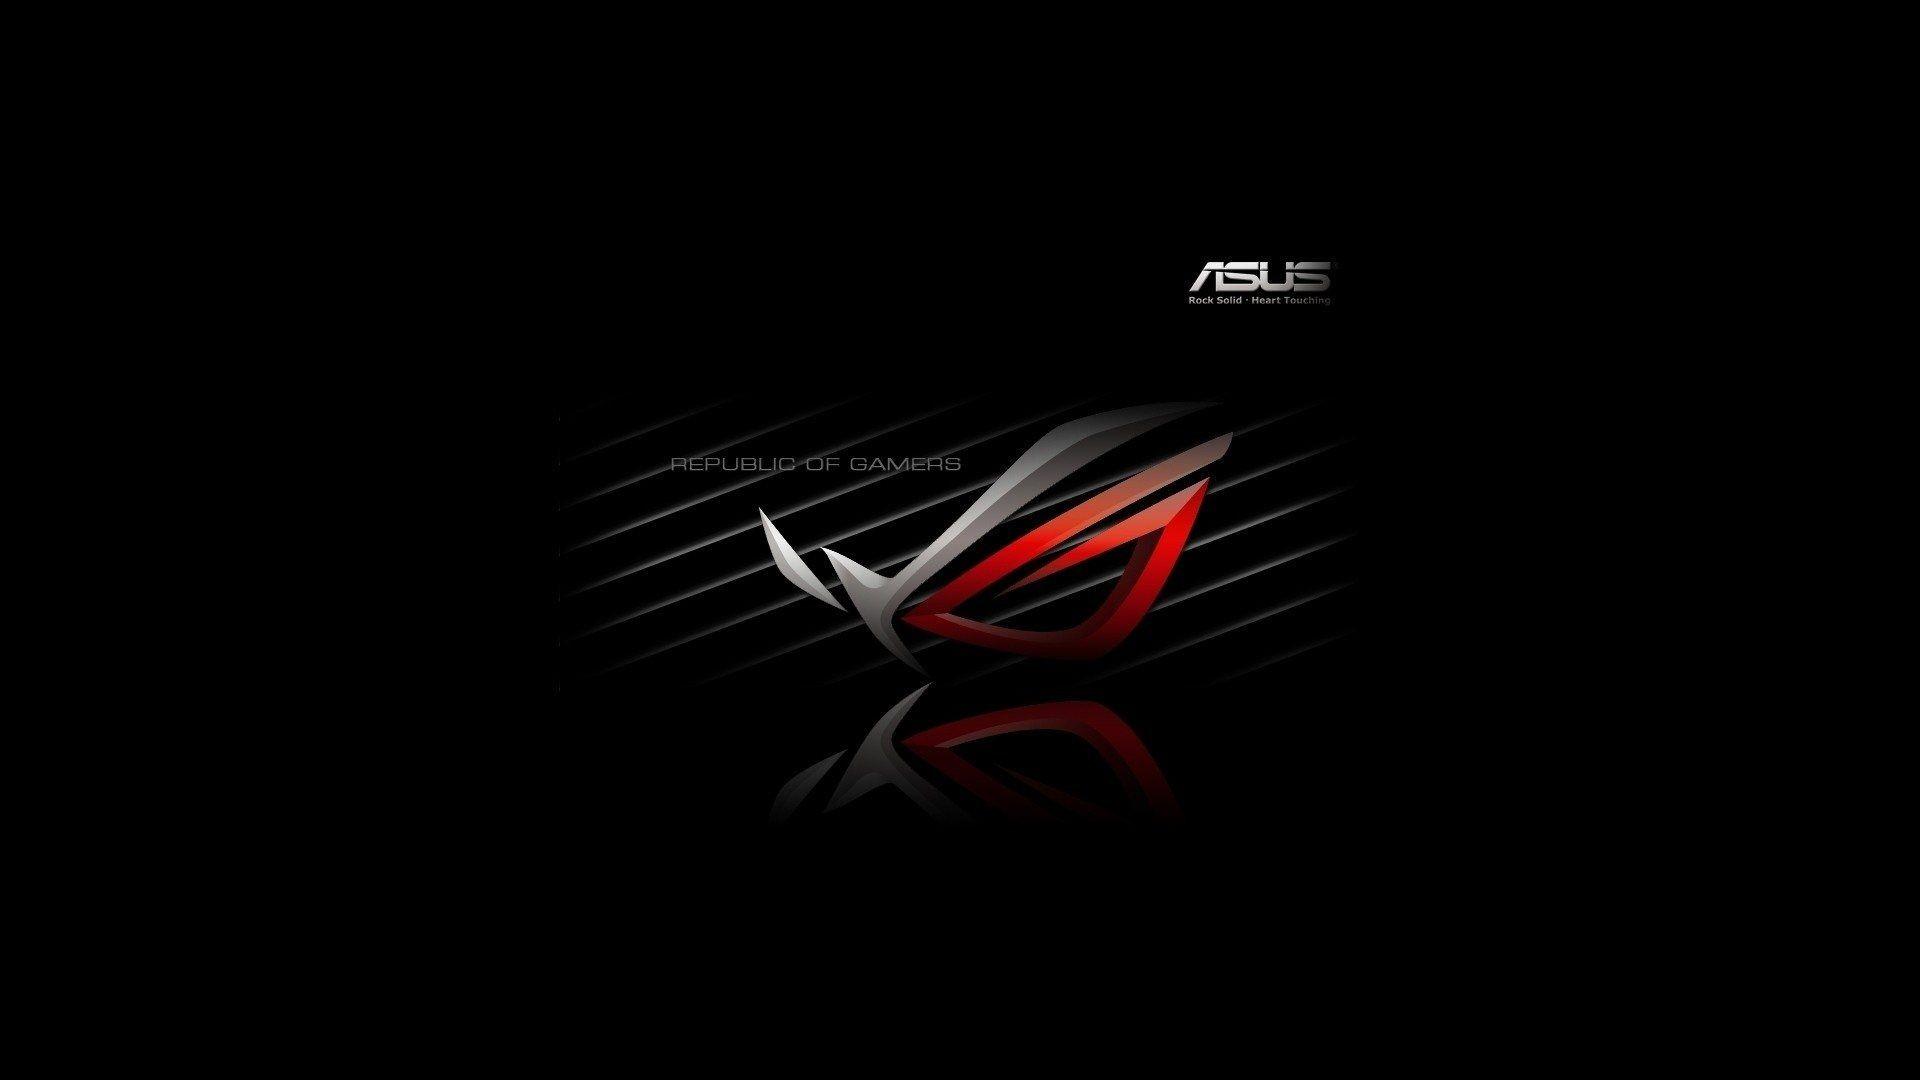 Image Result For Asus Gaming Logo Wallpapera